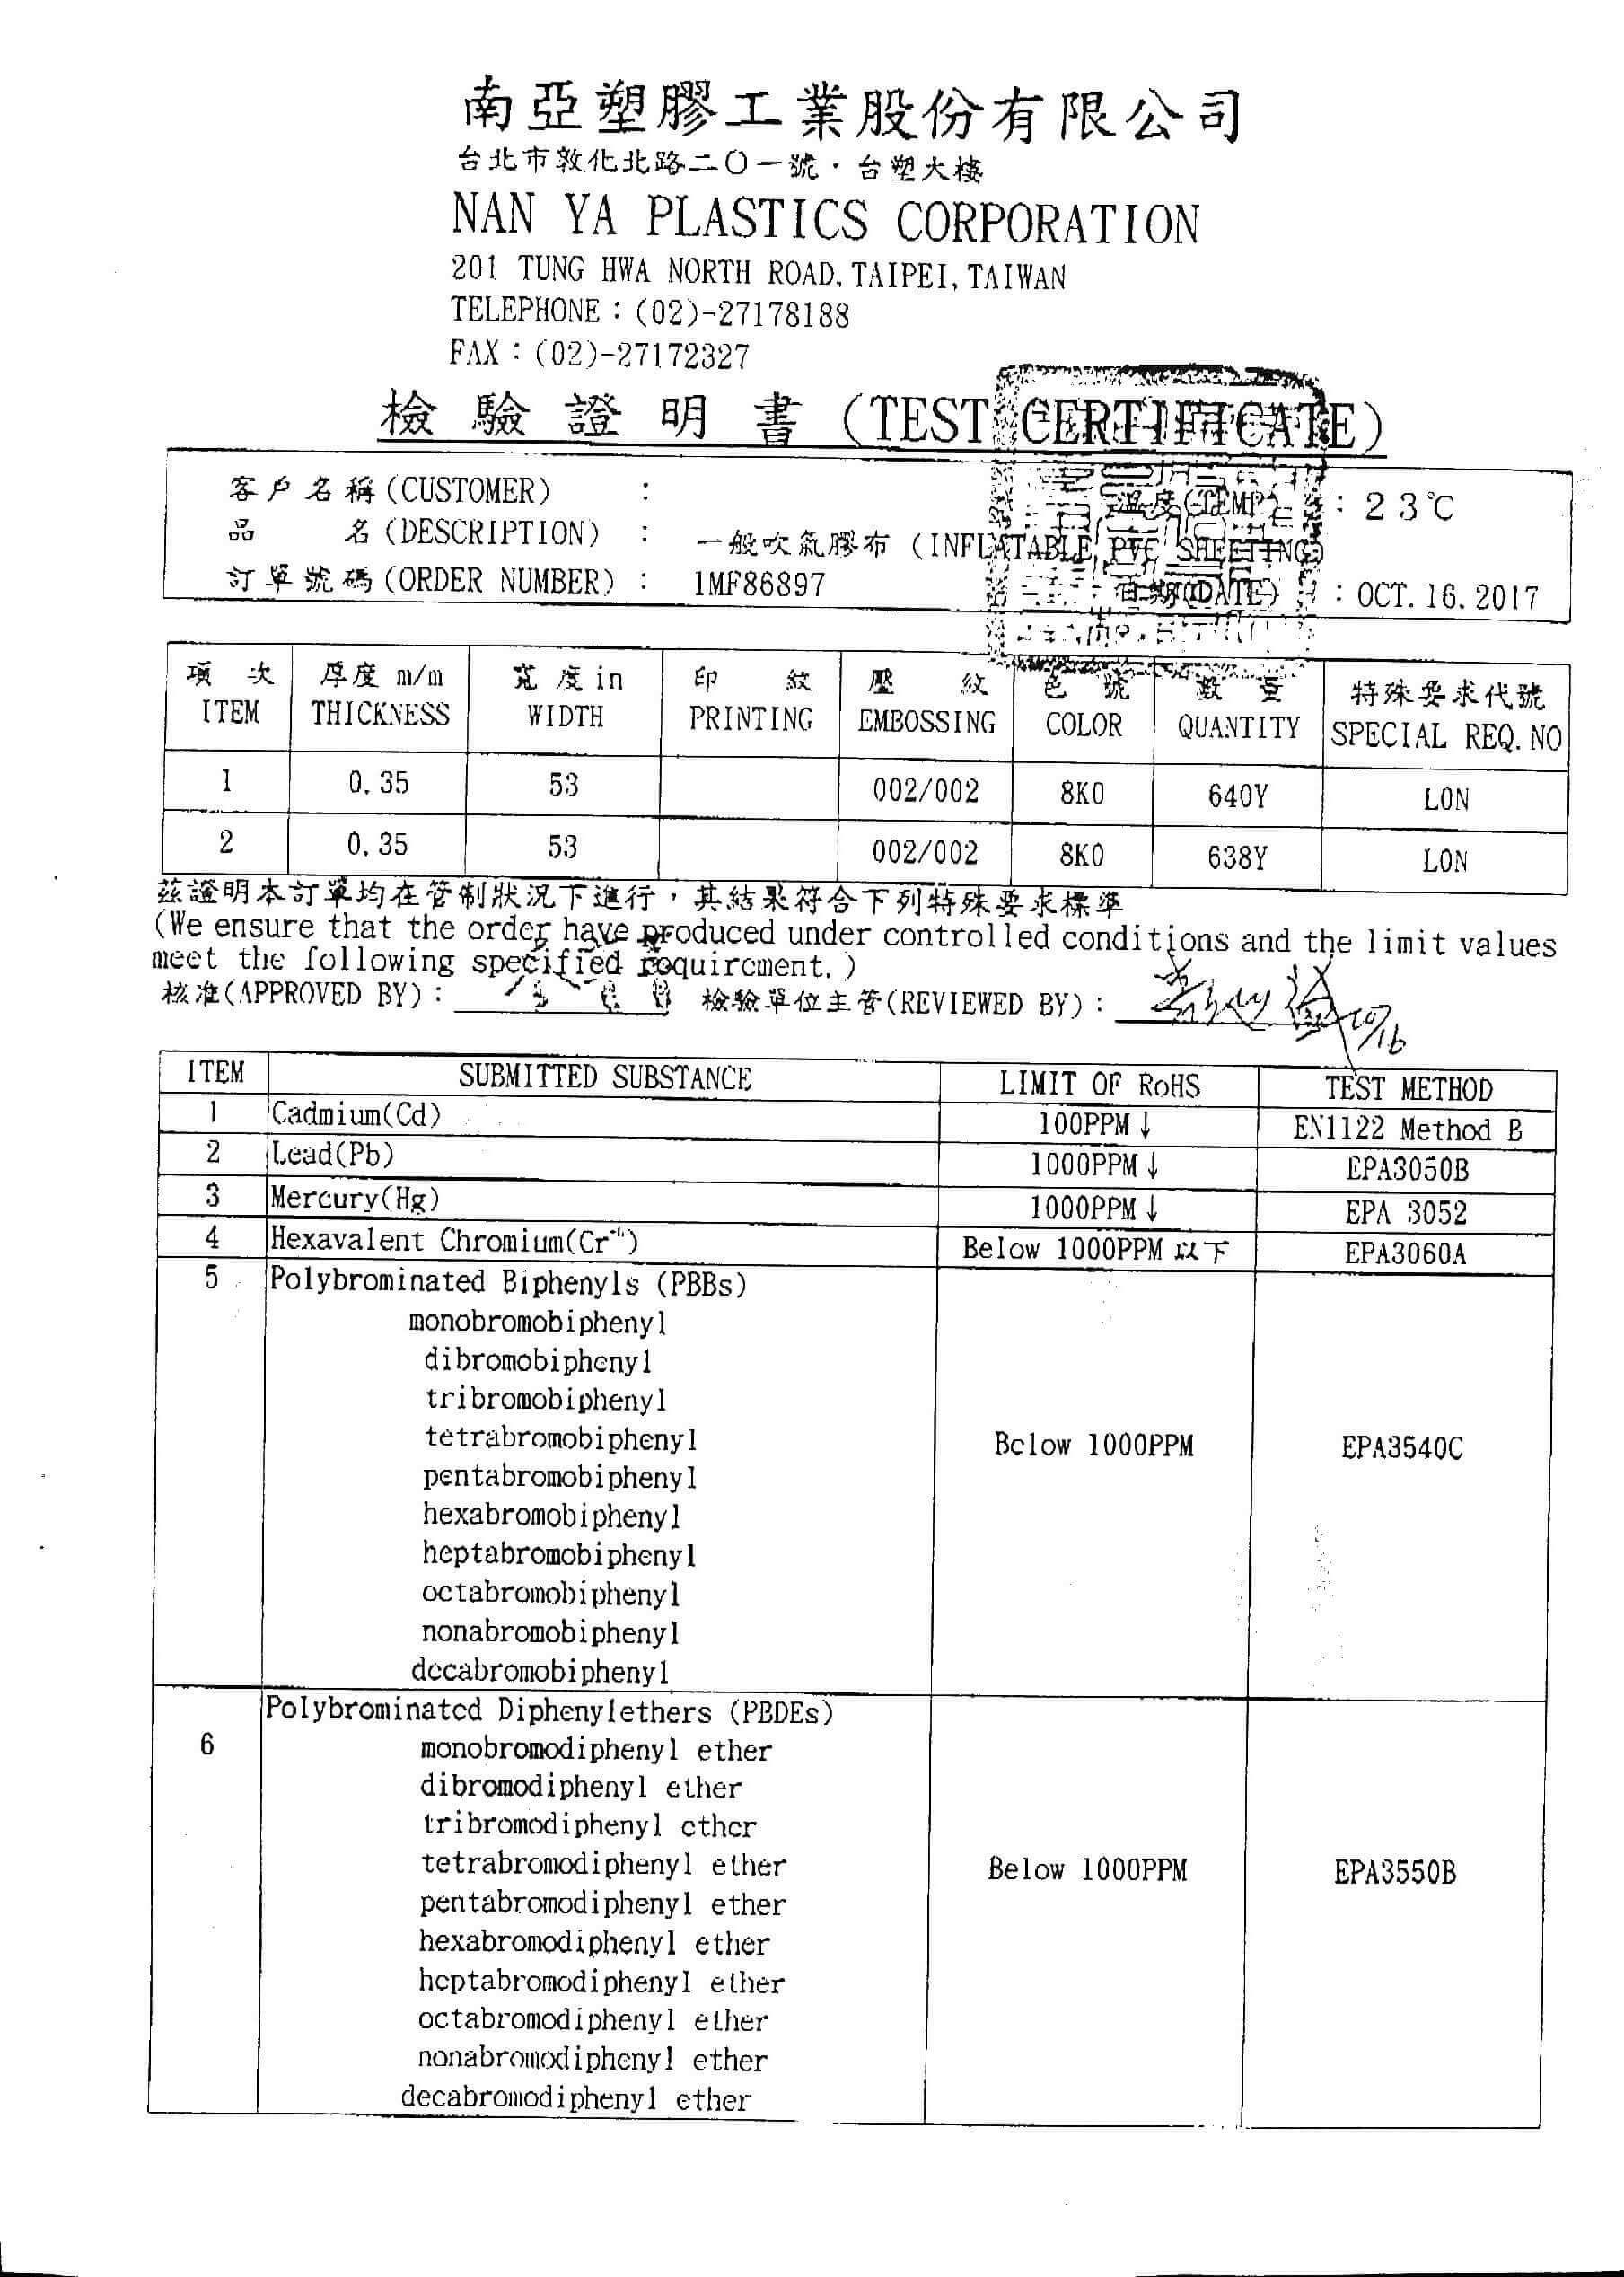 Blue PVC material report page 1藍色PVC檢驗證明報告第一頁